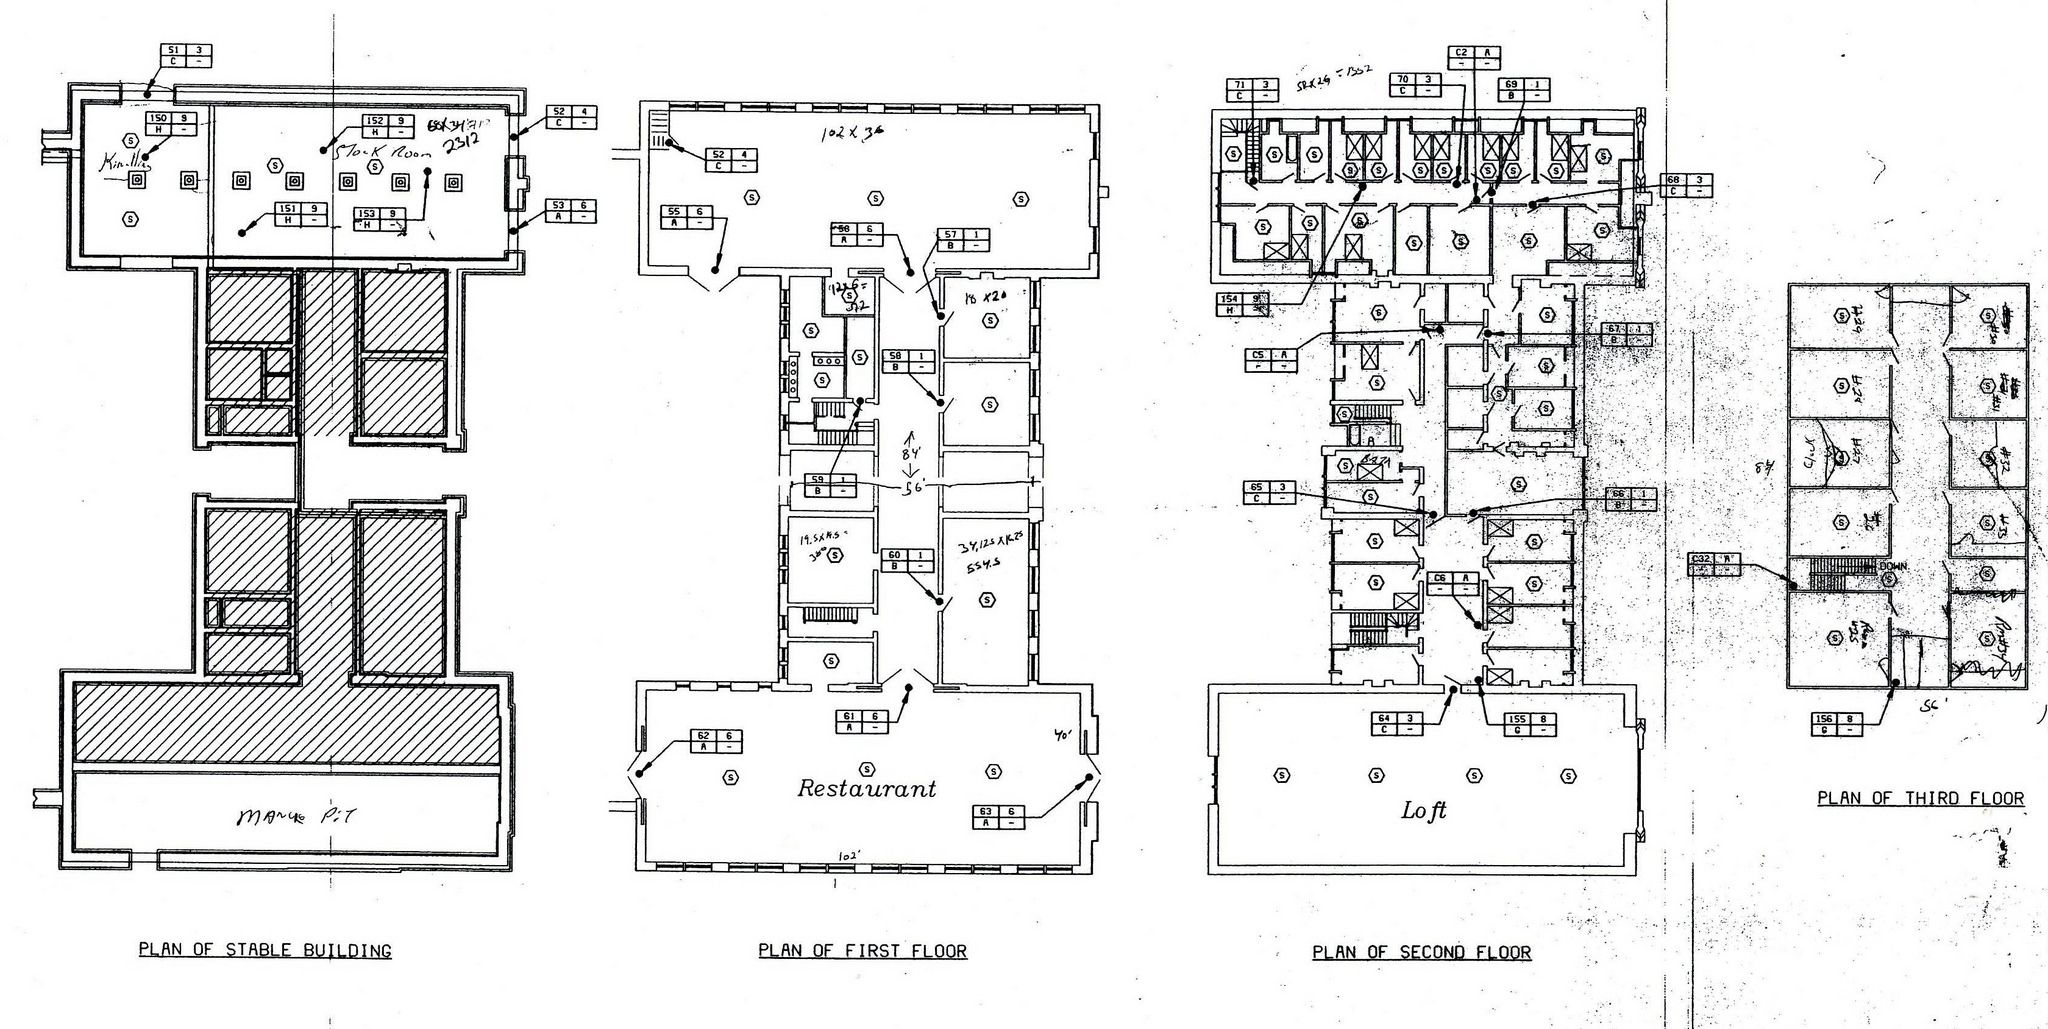 Biltmore 125 Biltmore Estate Biltmore House Mansion Floor Plan